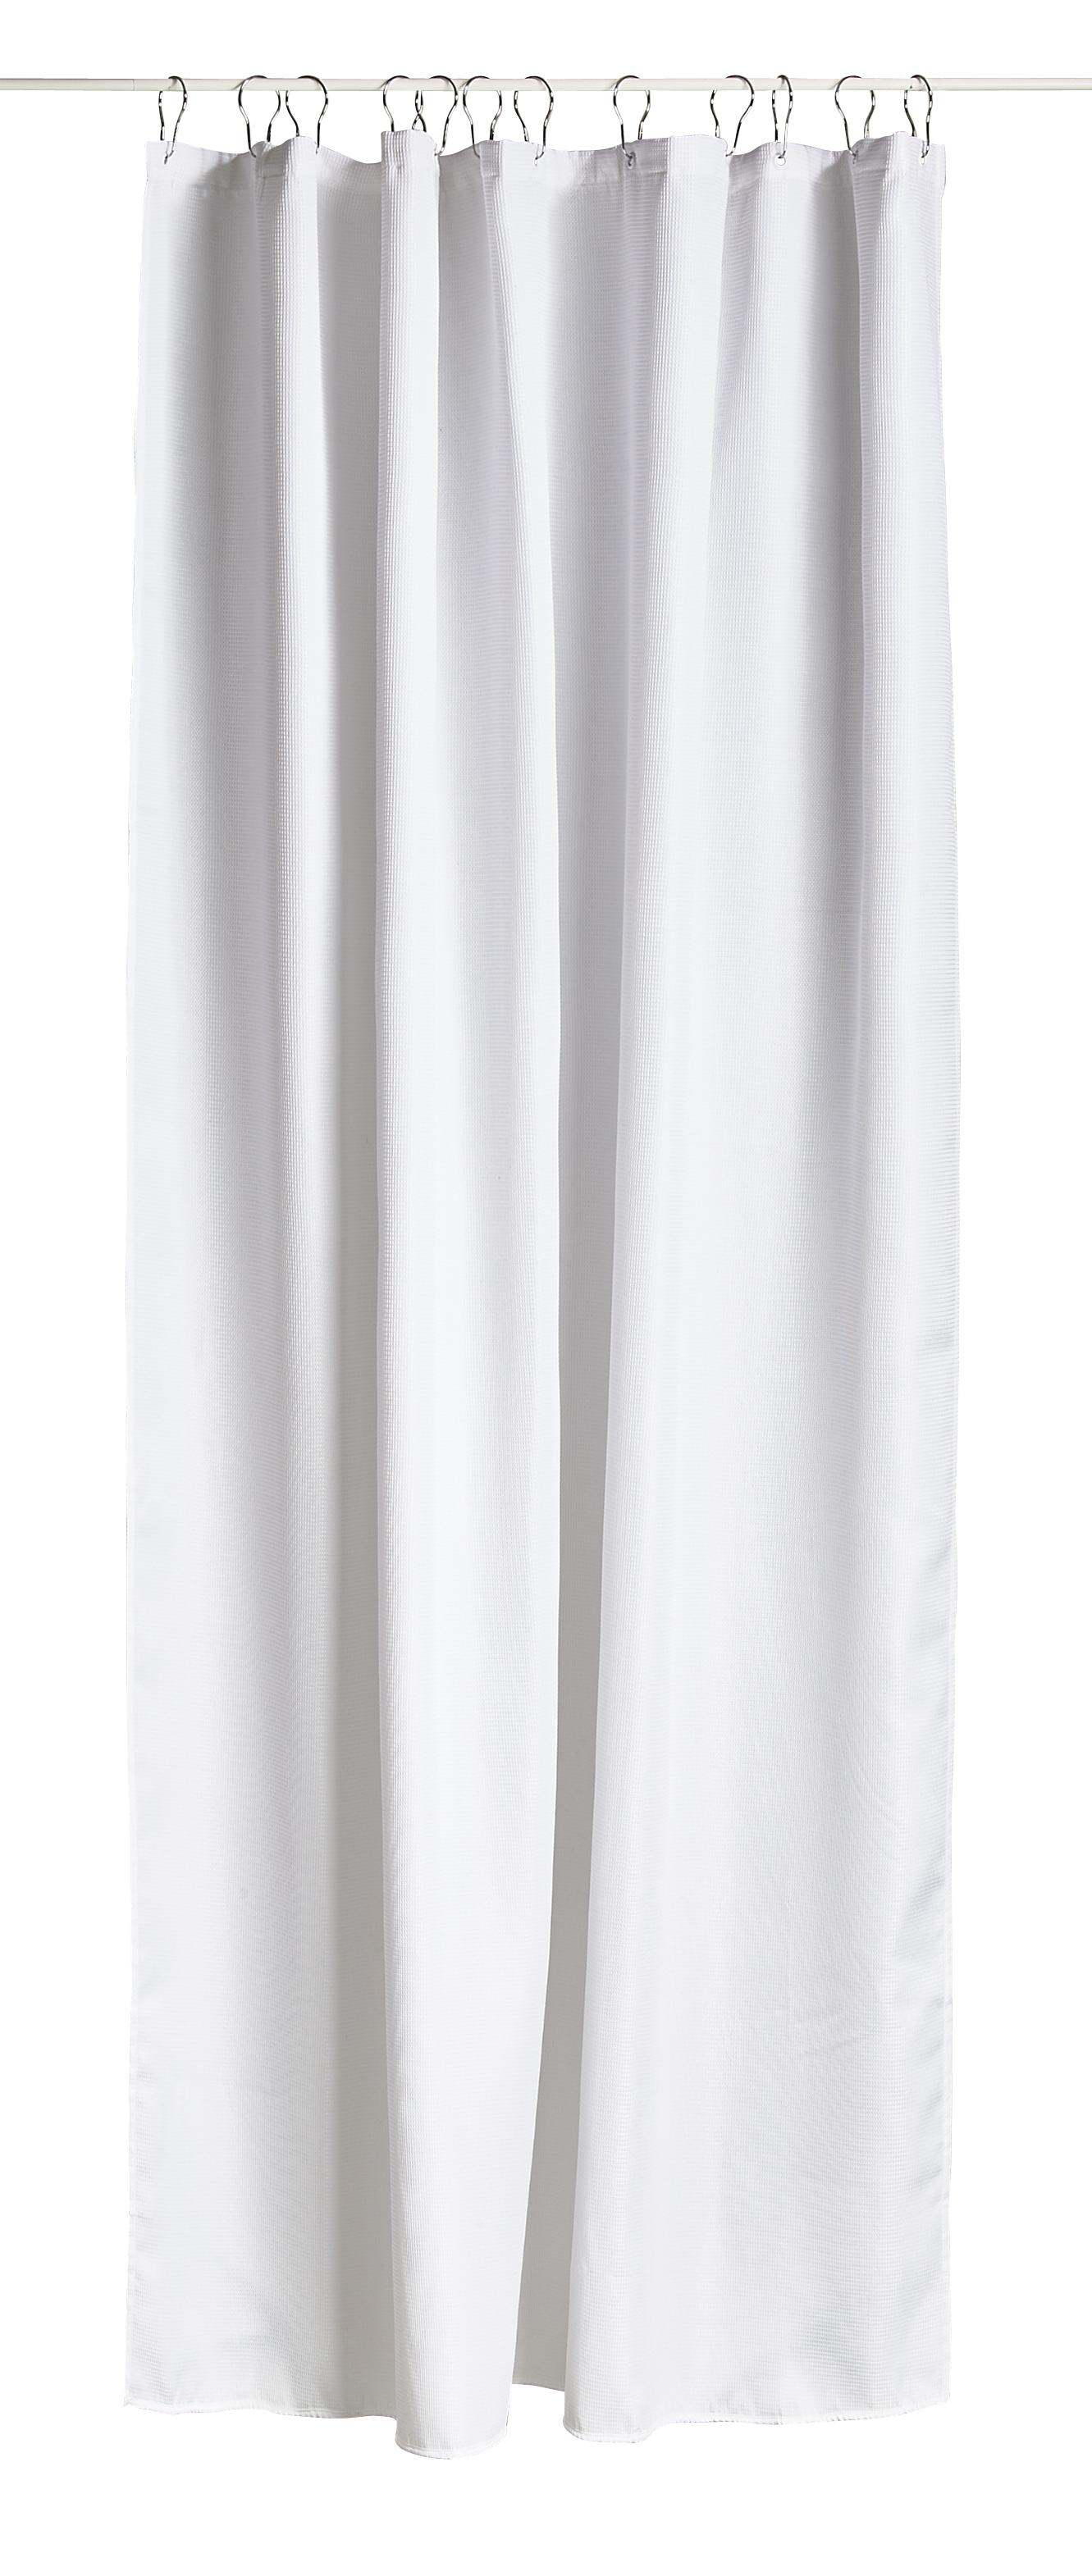 Zone - Lux Shower Curtain - White (330129)